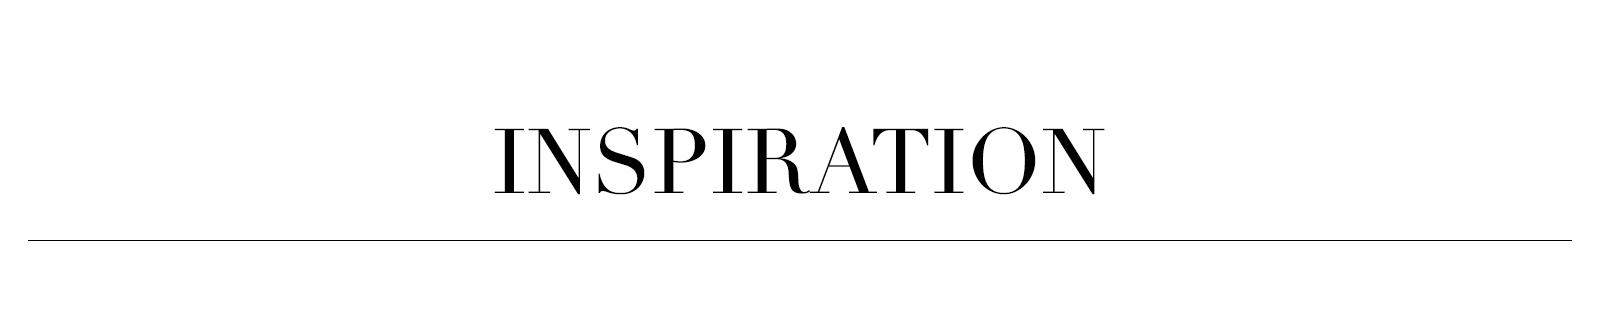 inspiration text.jpg